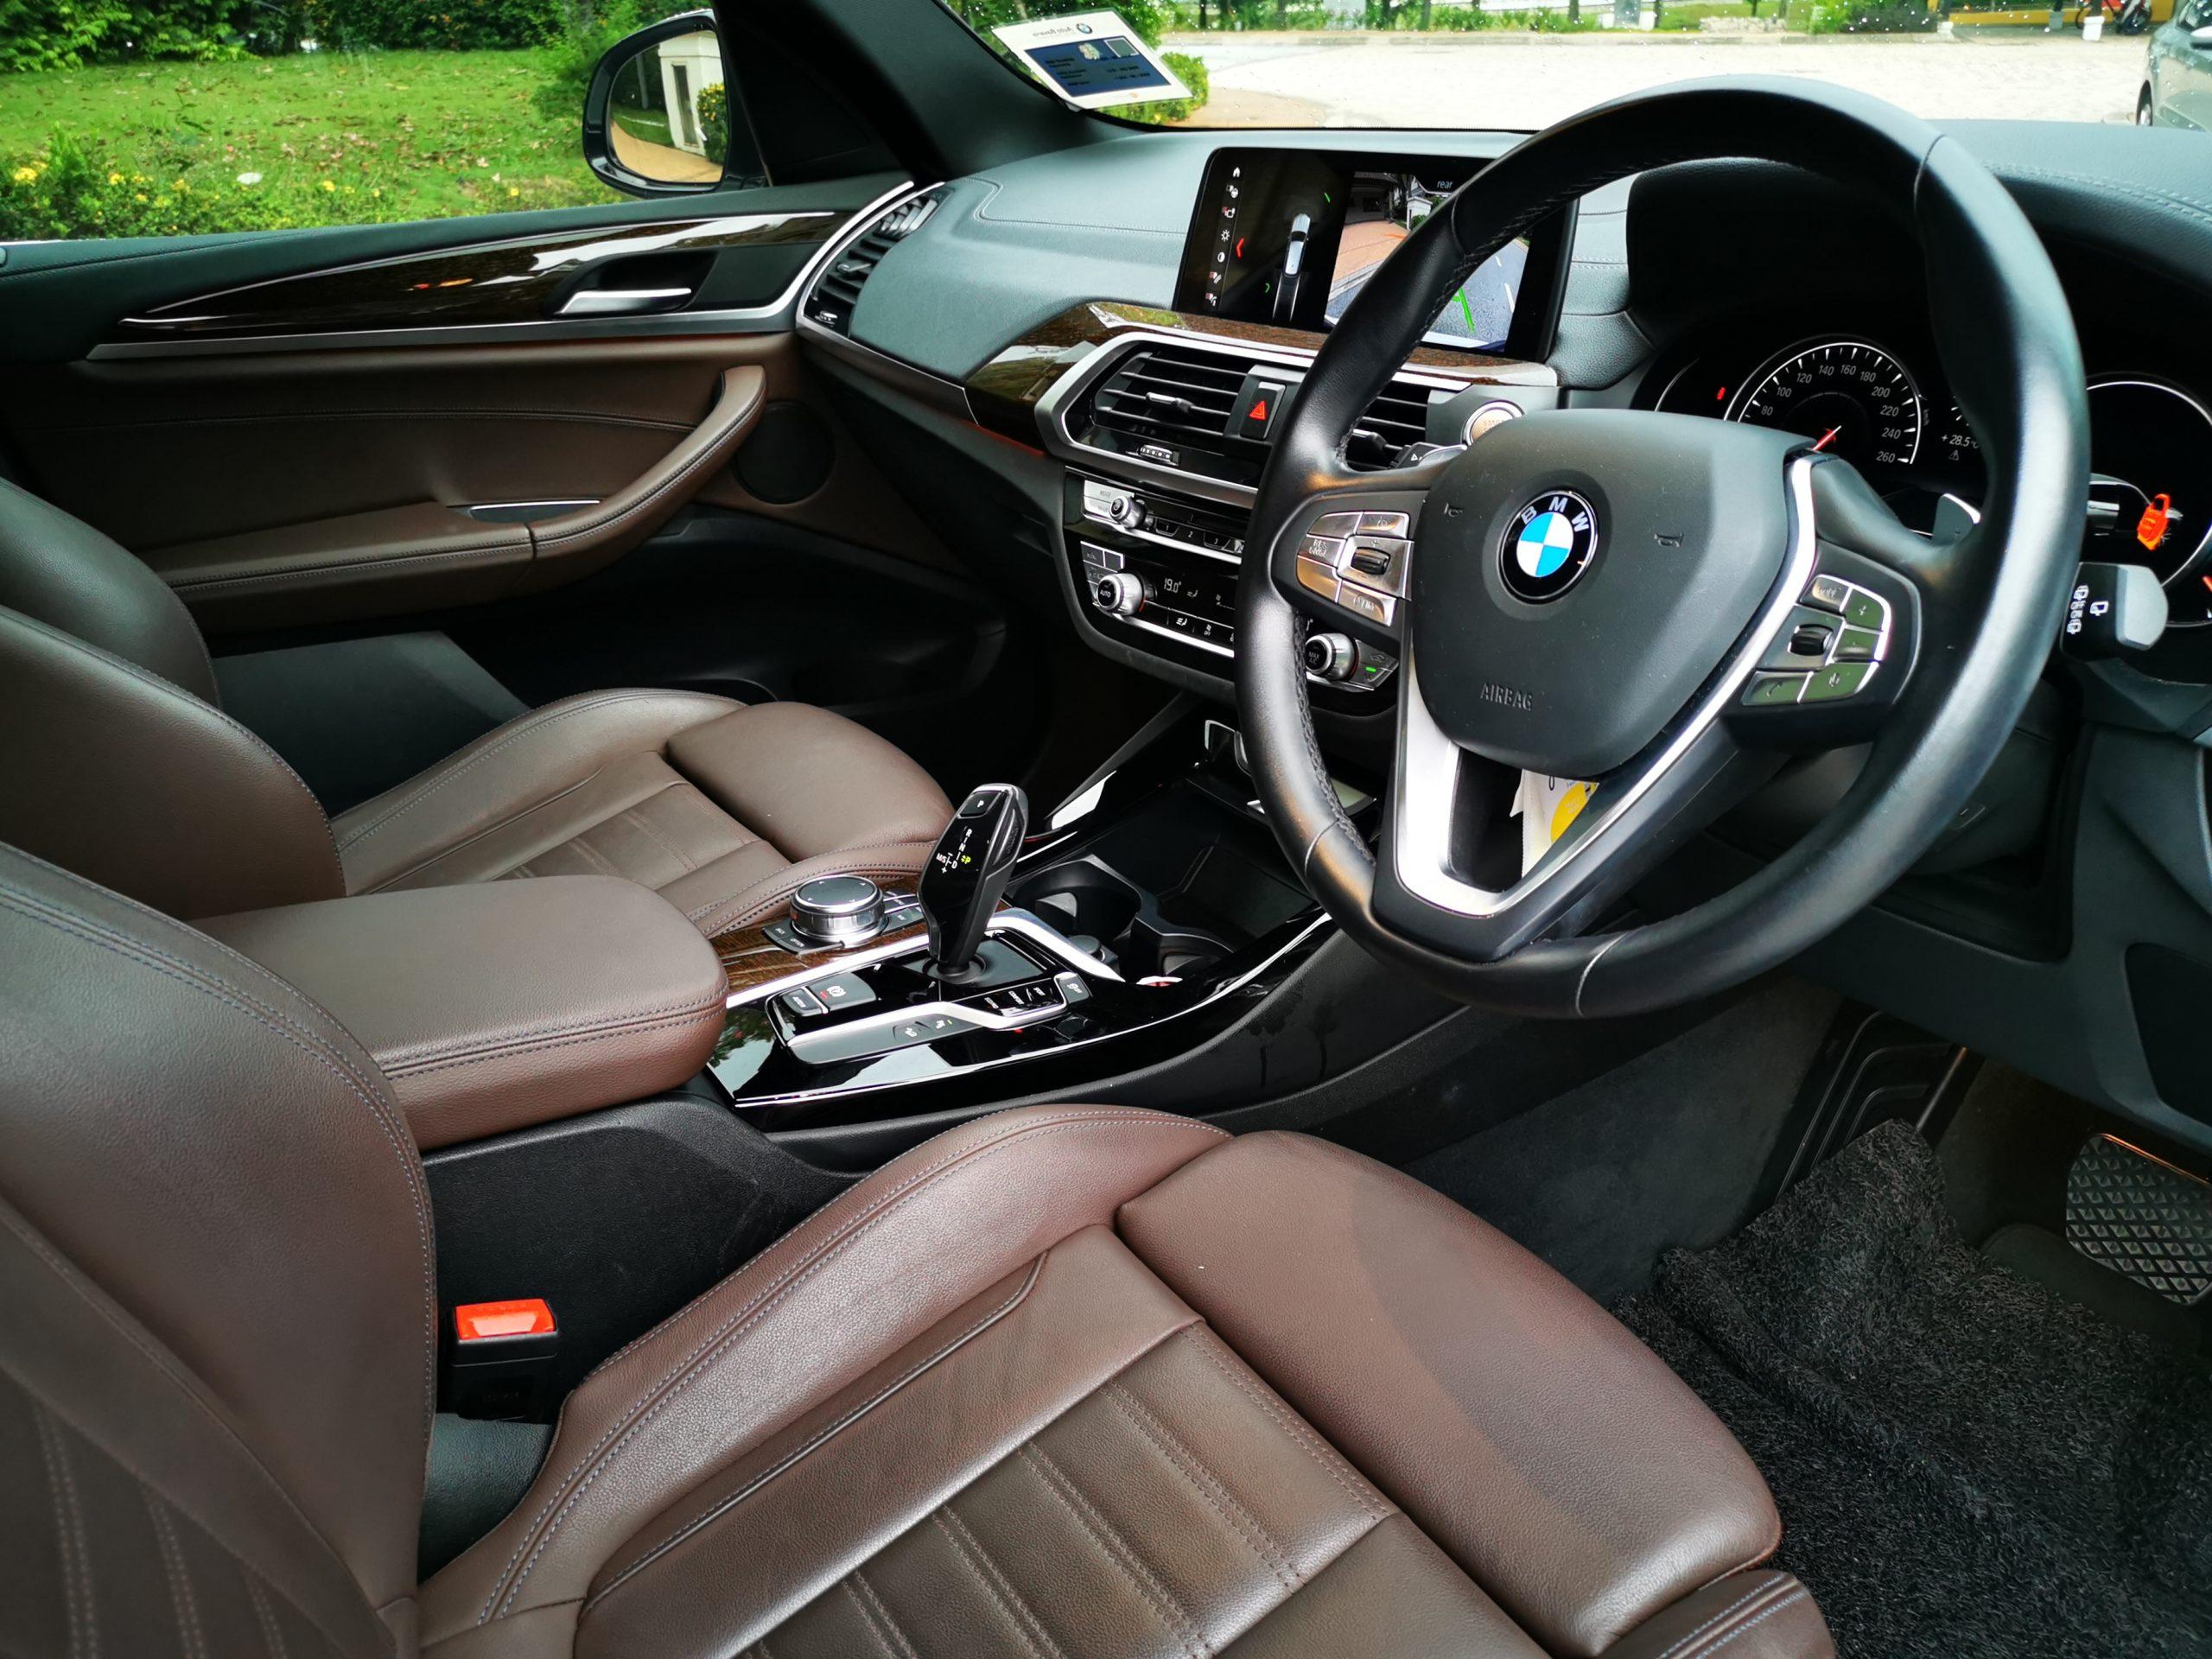 BMW X3 Steering Dashboard